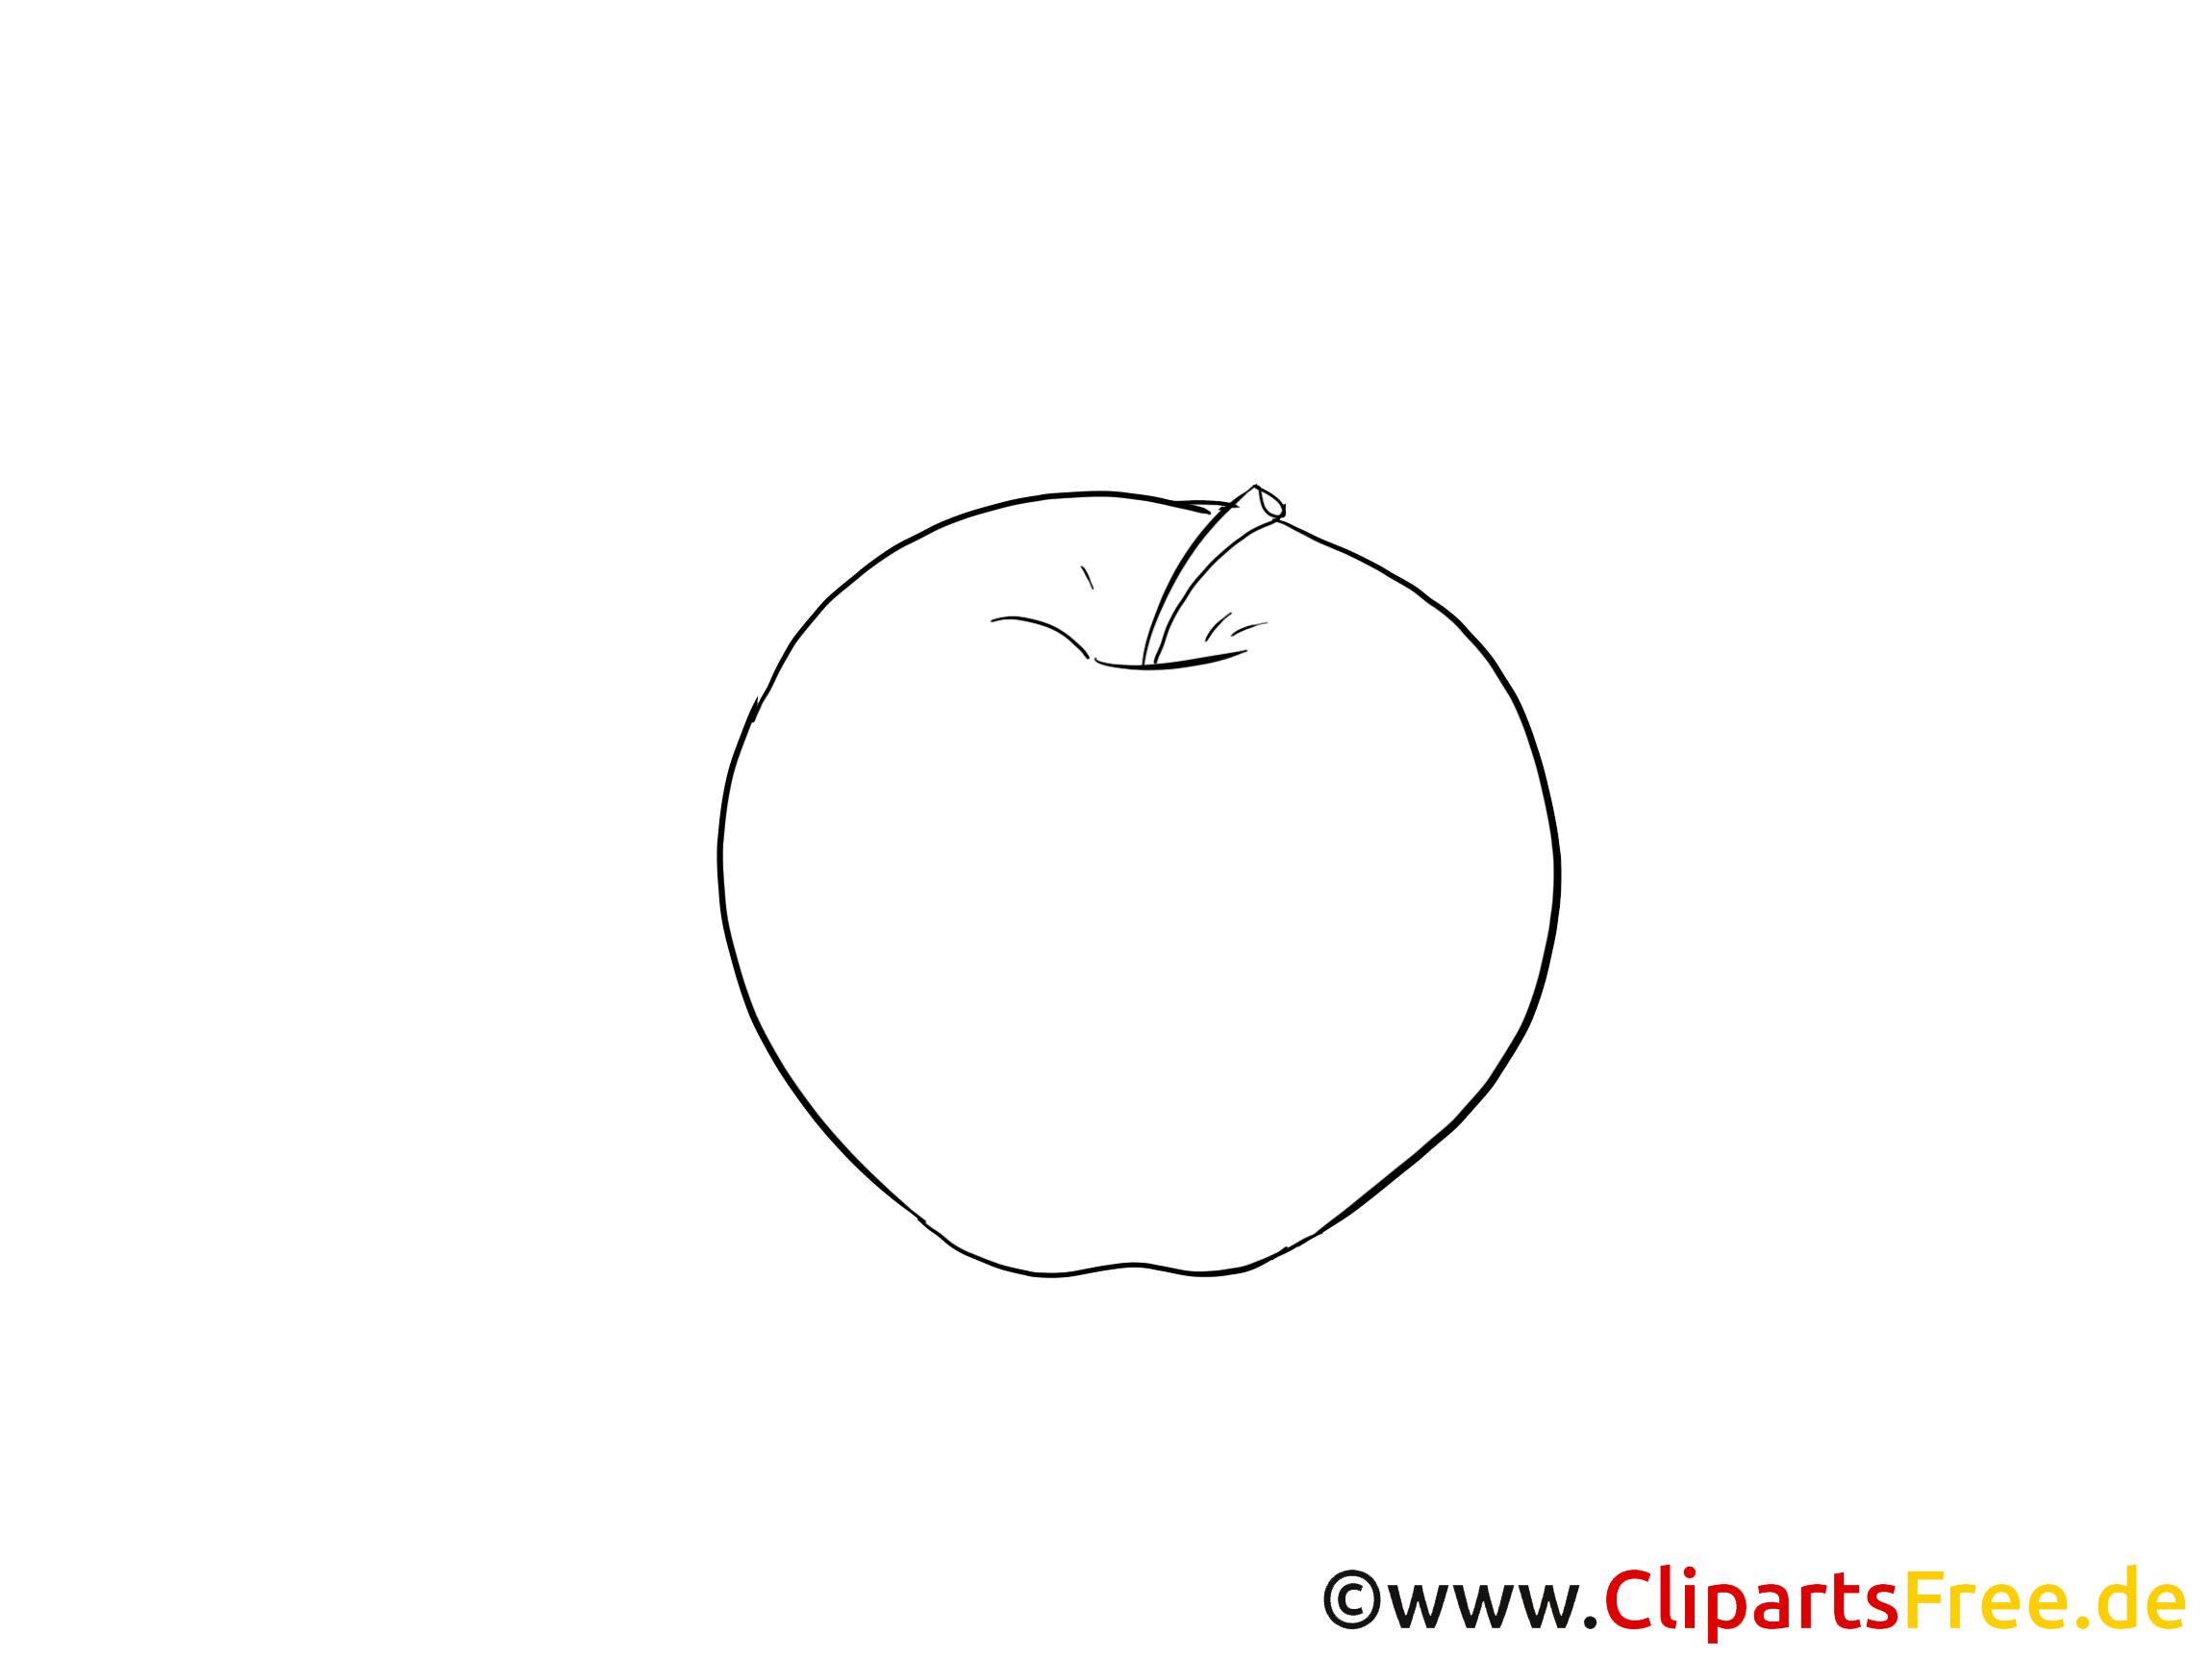 Bild zum Malen Apfel